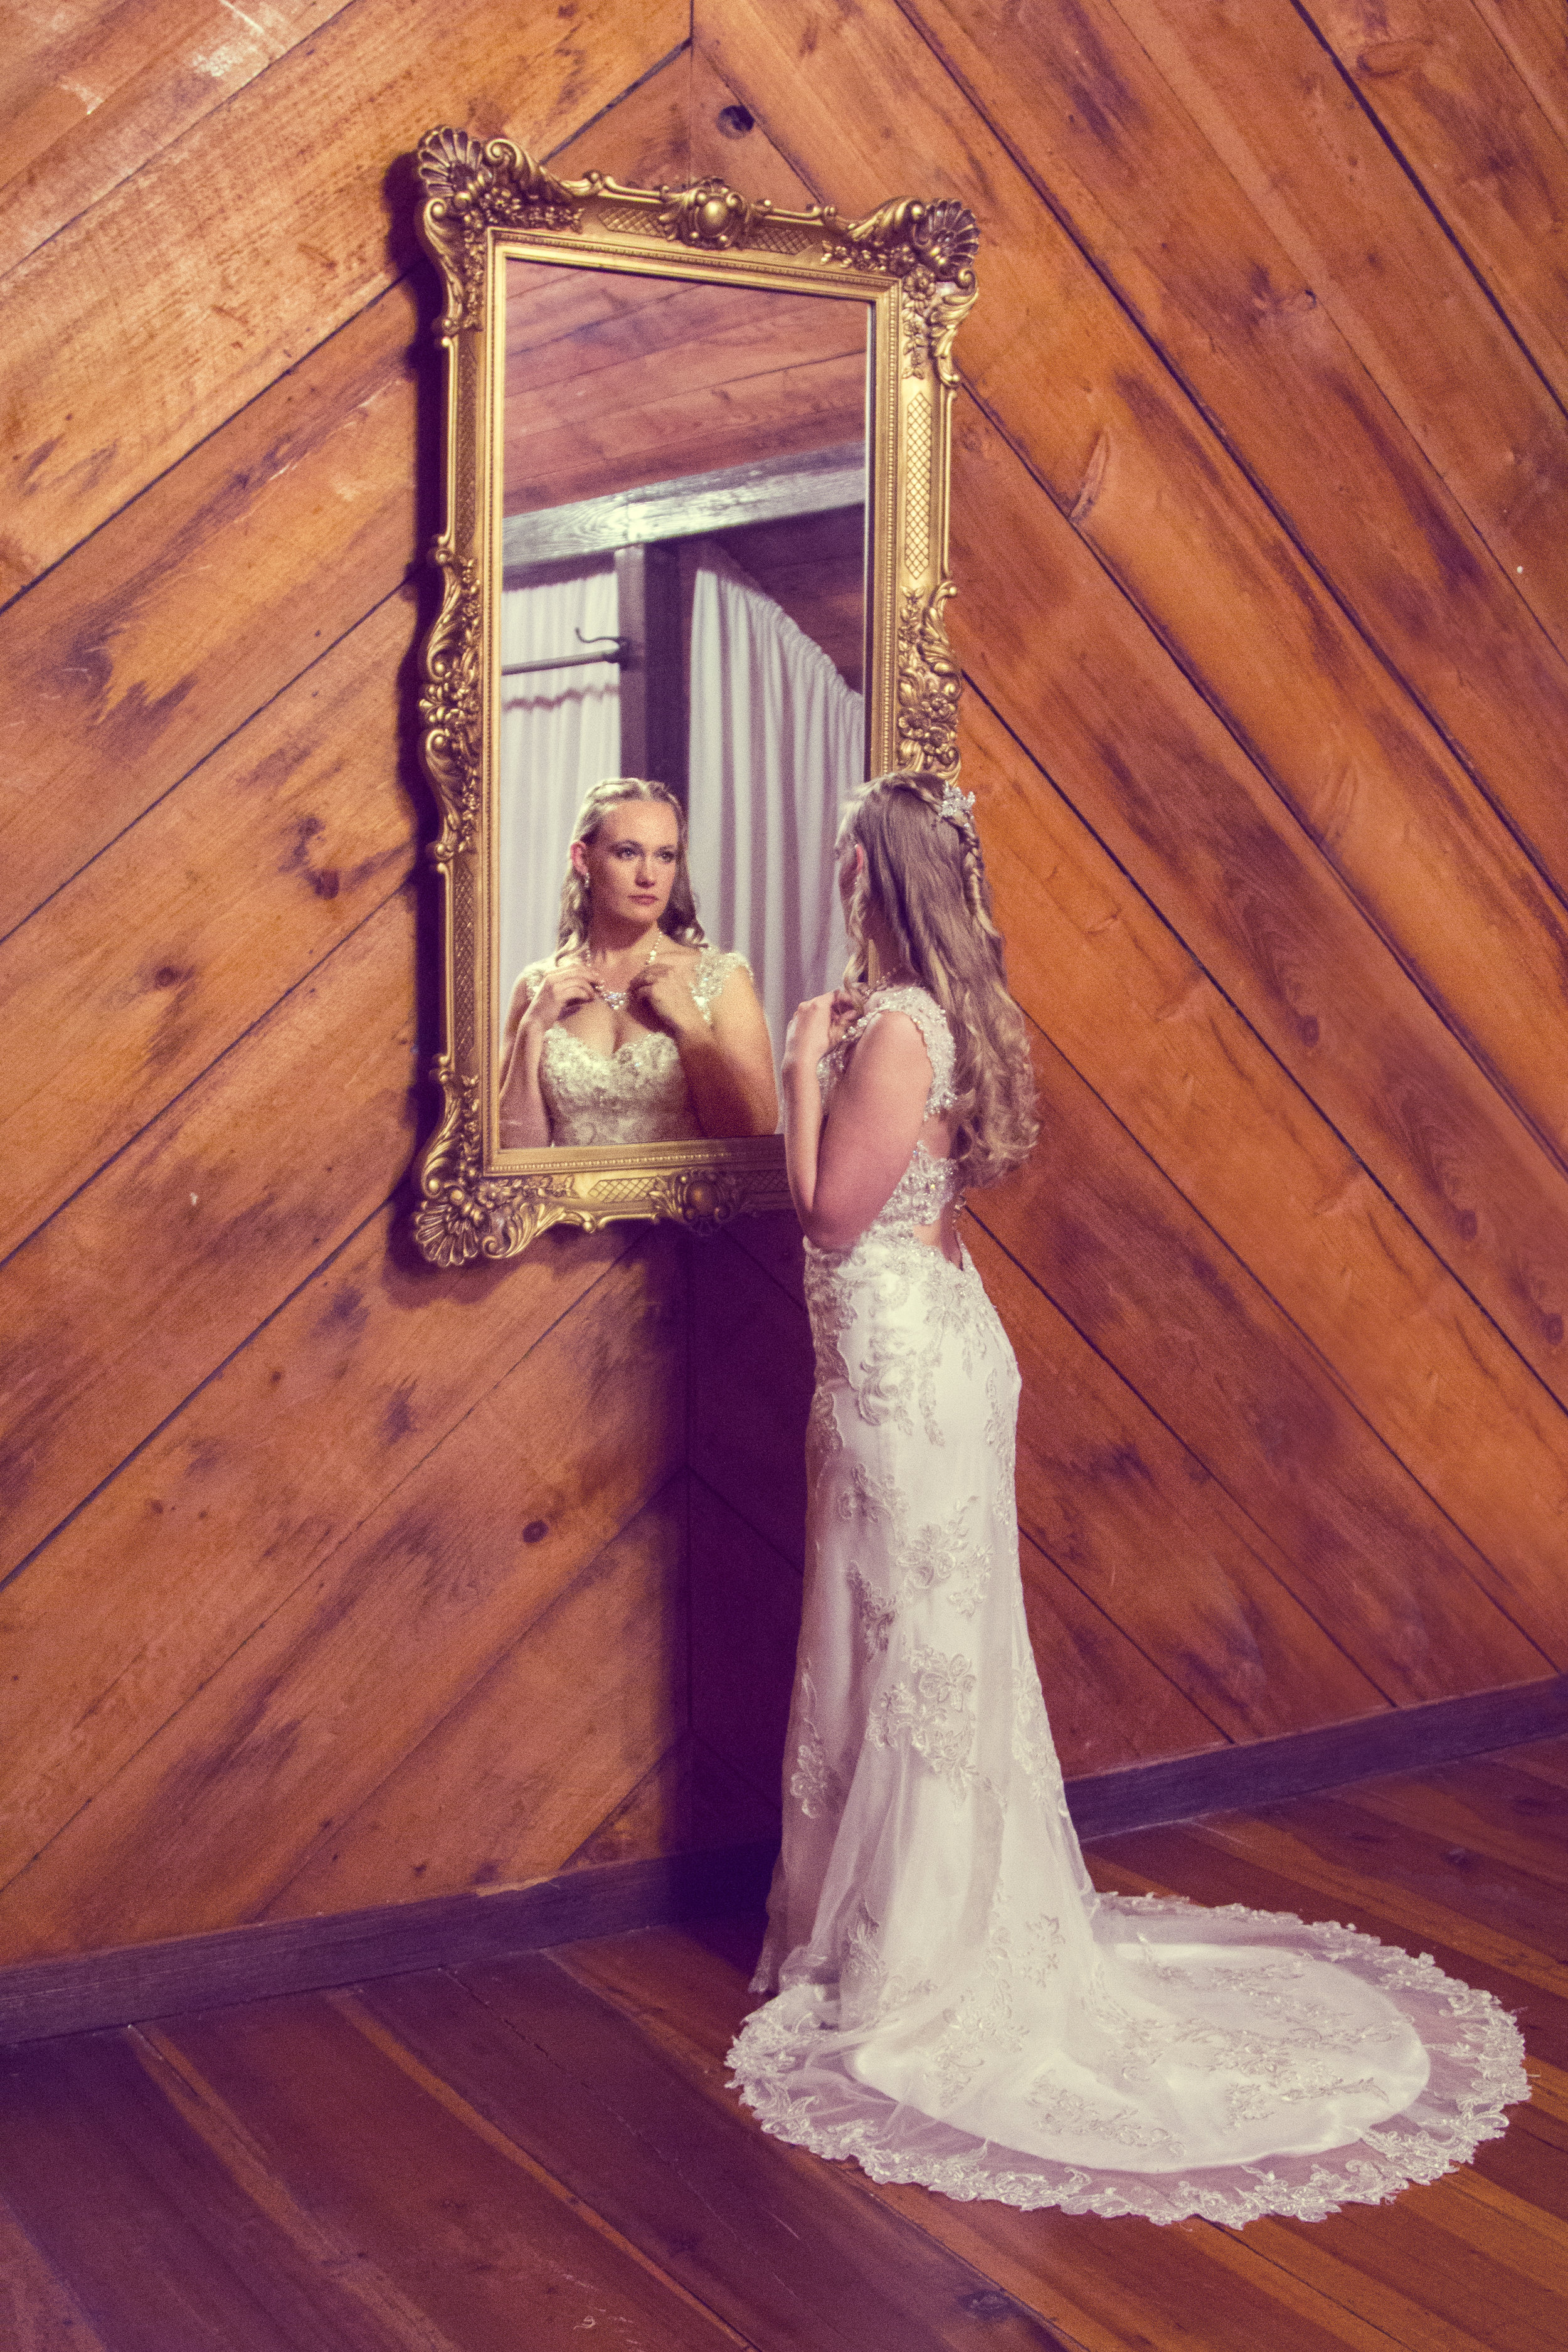 Baton Rouge Wedding Photography Photographer